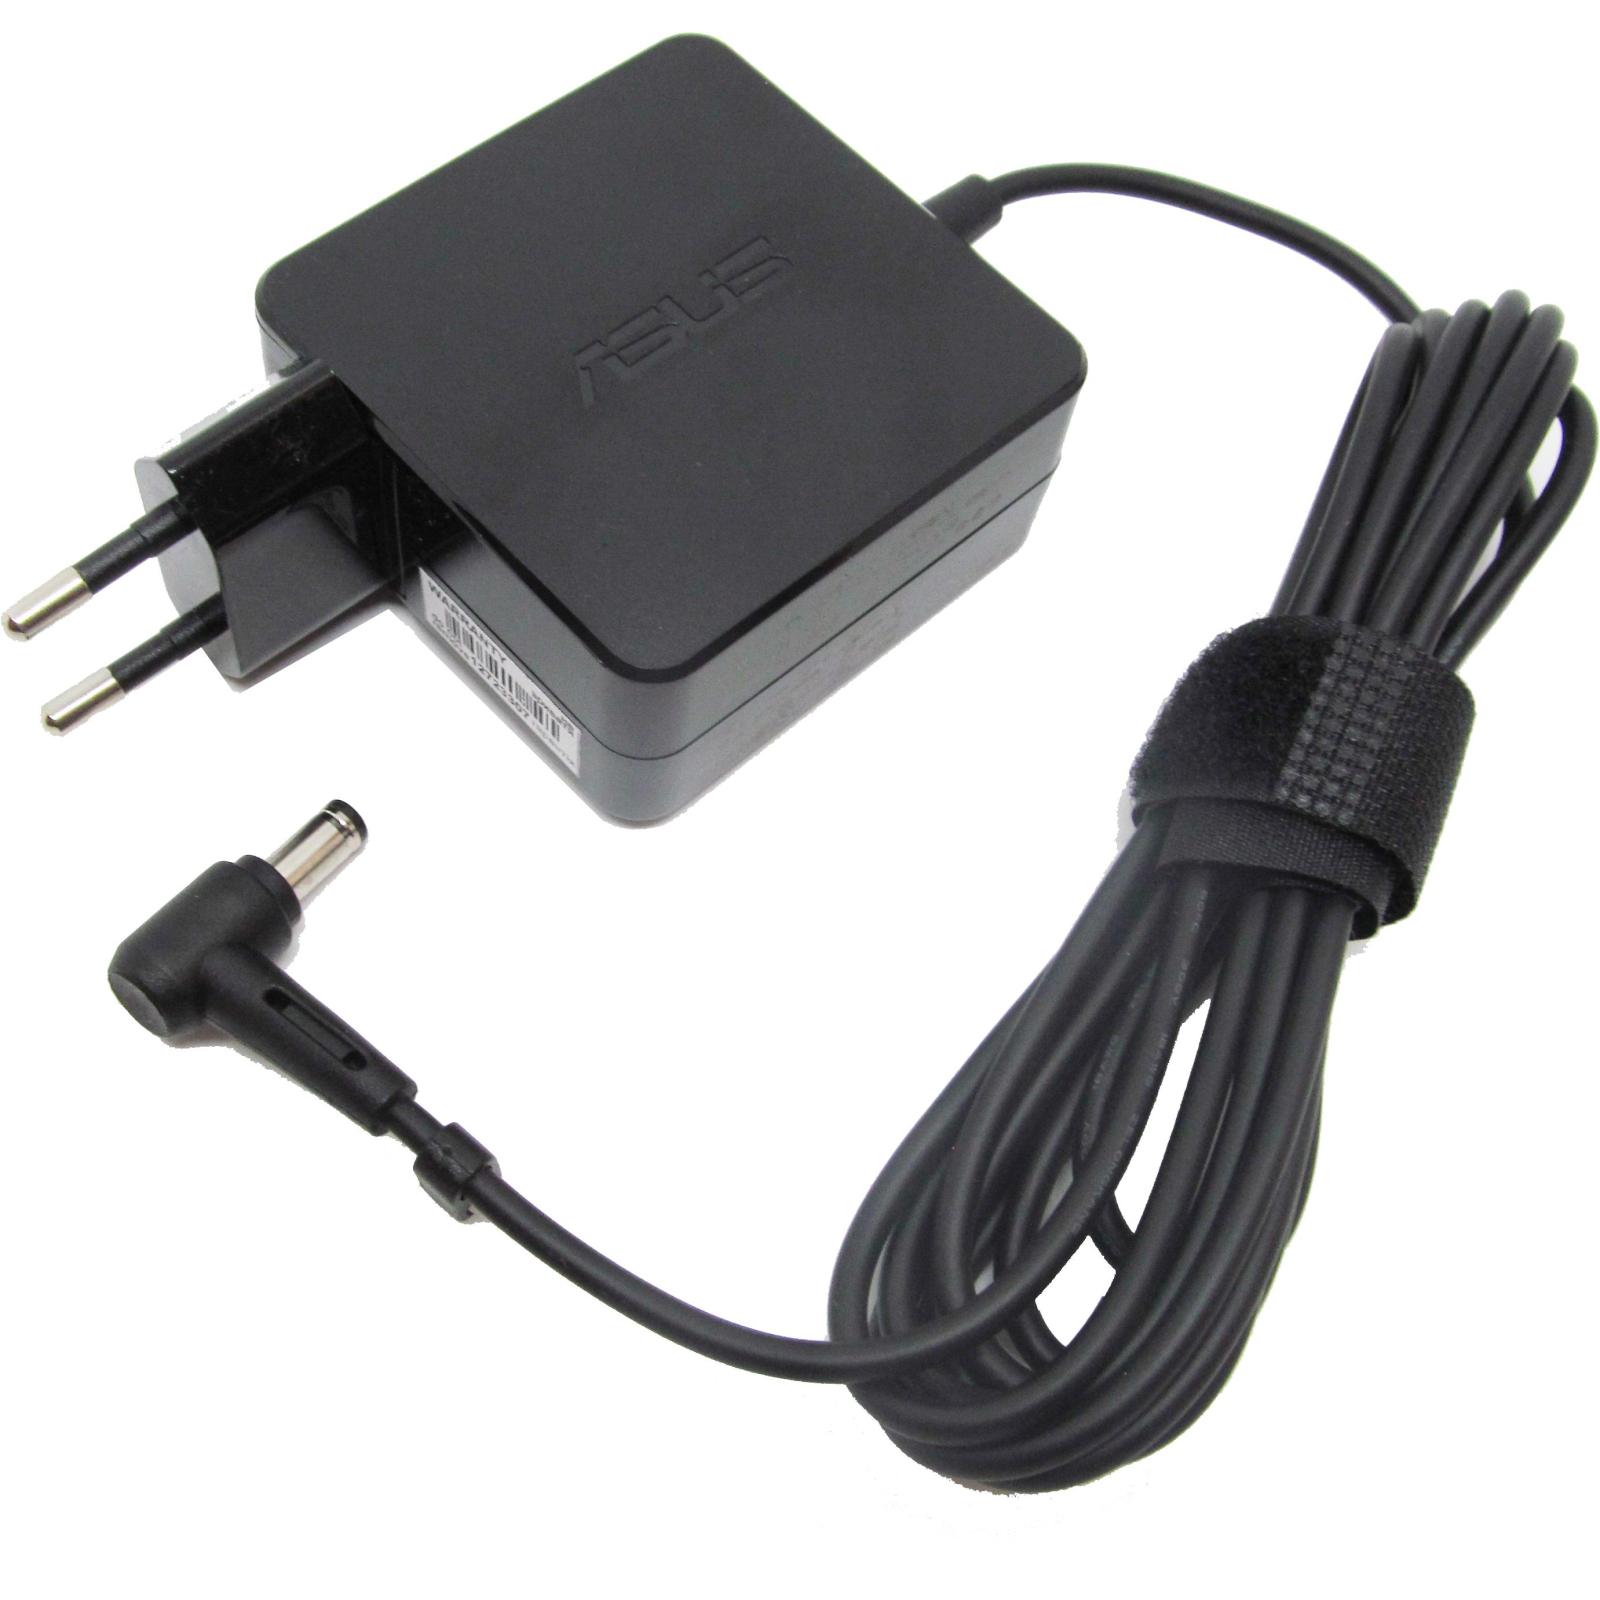 Блок питания к ноутбуку ASUS 45W Zenbook 19V 2.37A 5.5/2.5 wall (ADP-45AW / A40220)